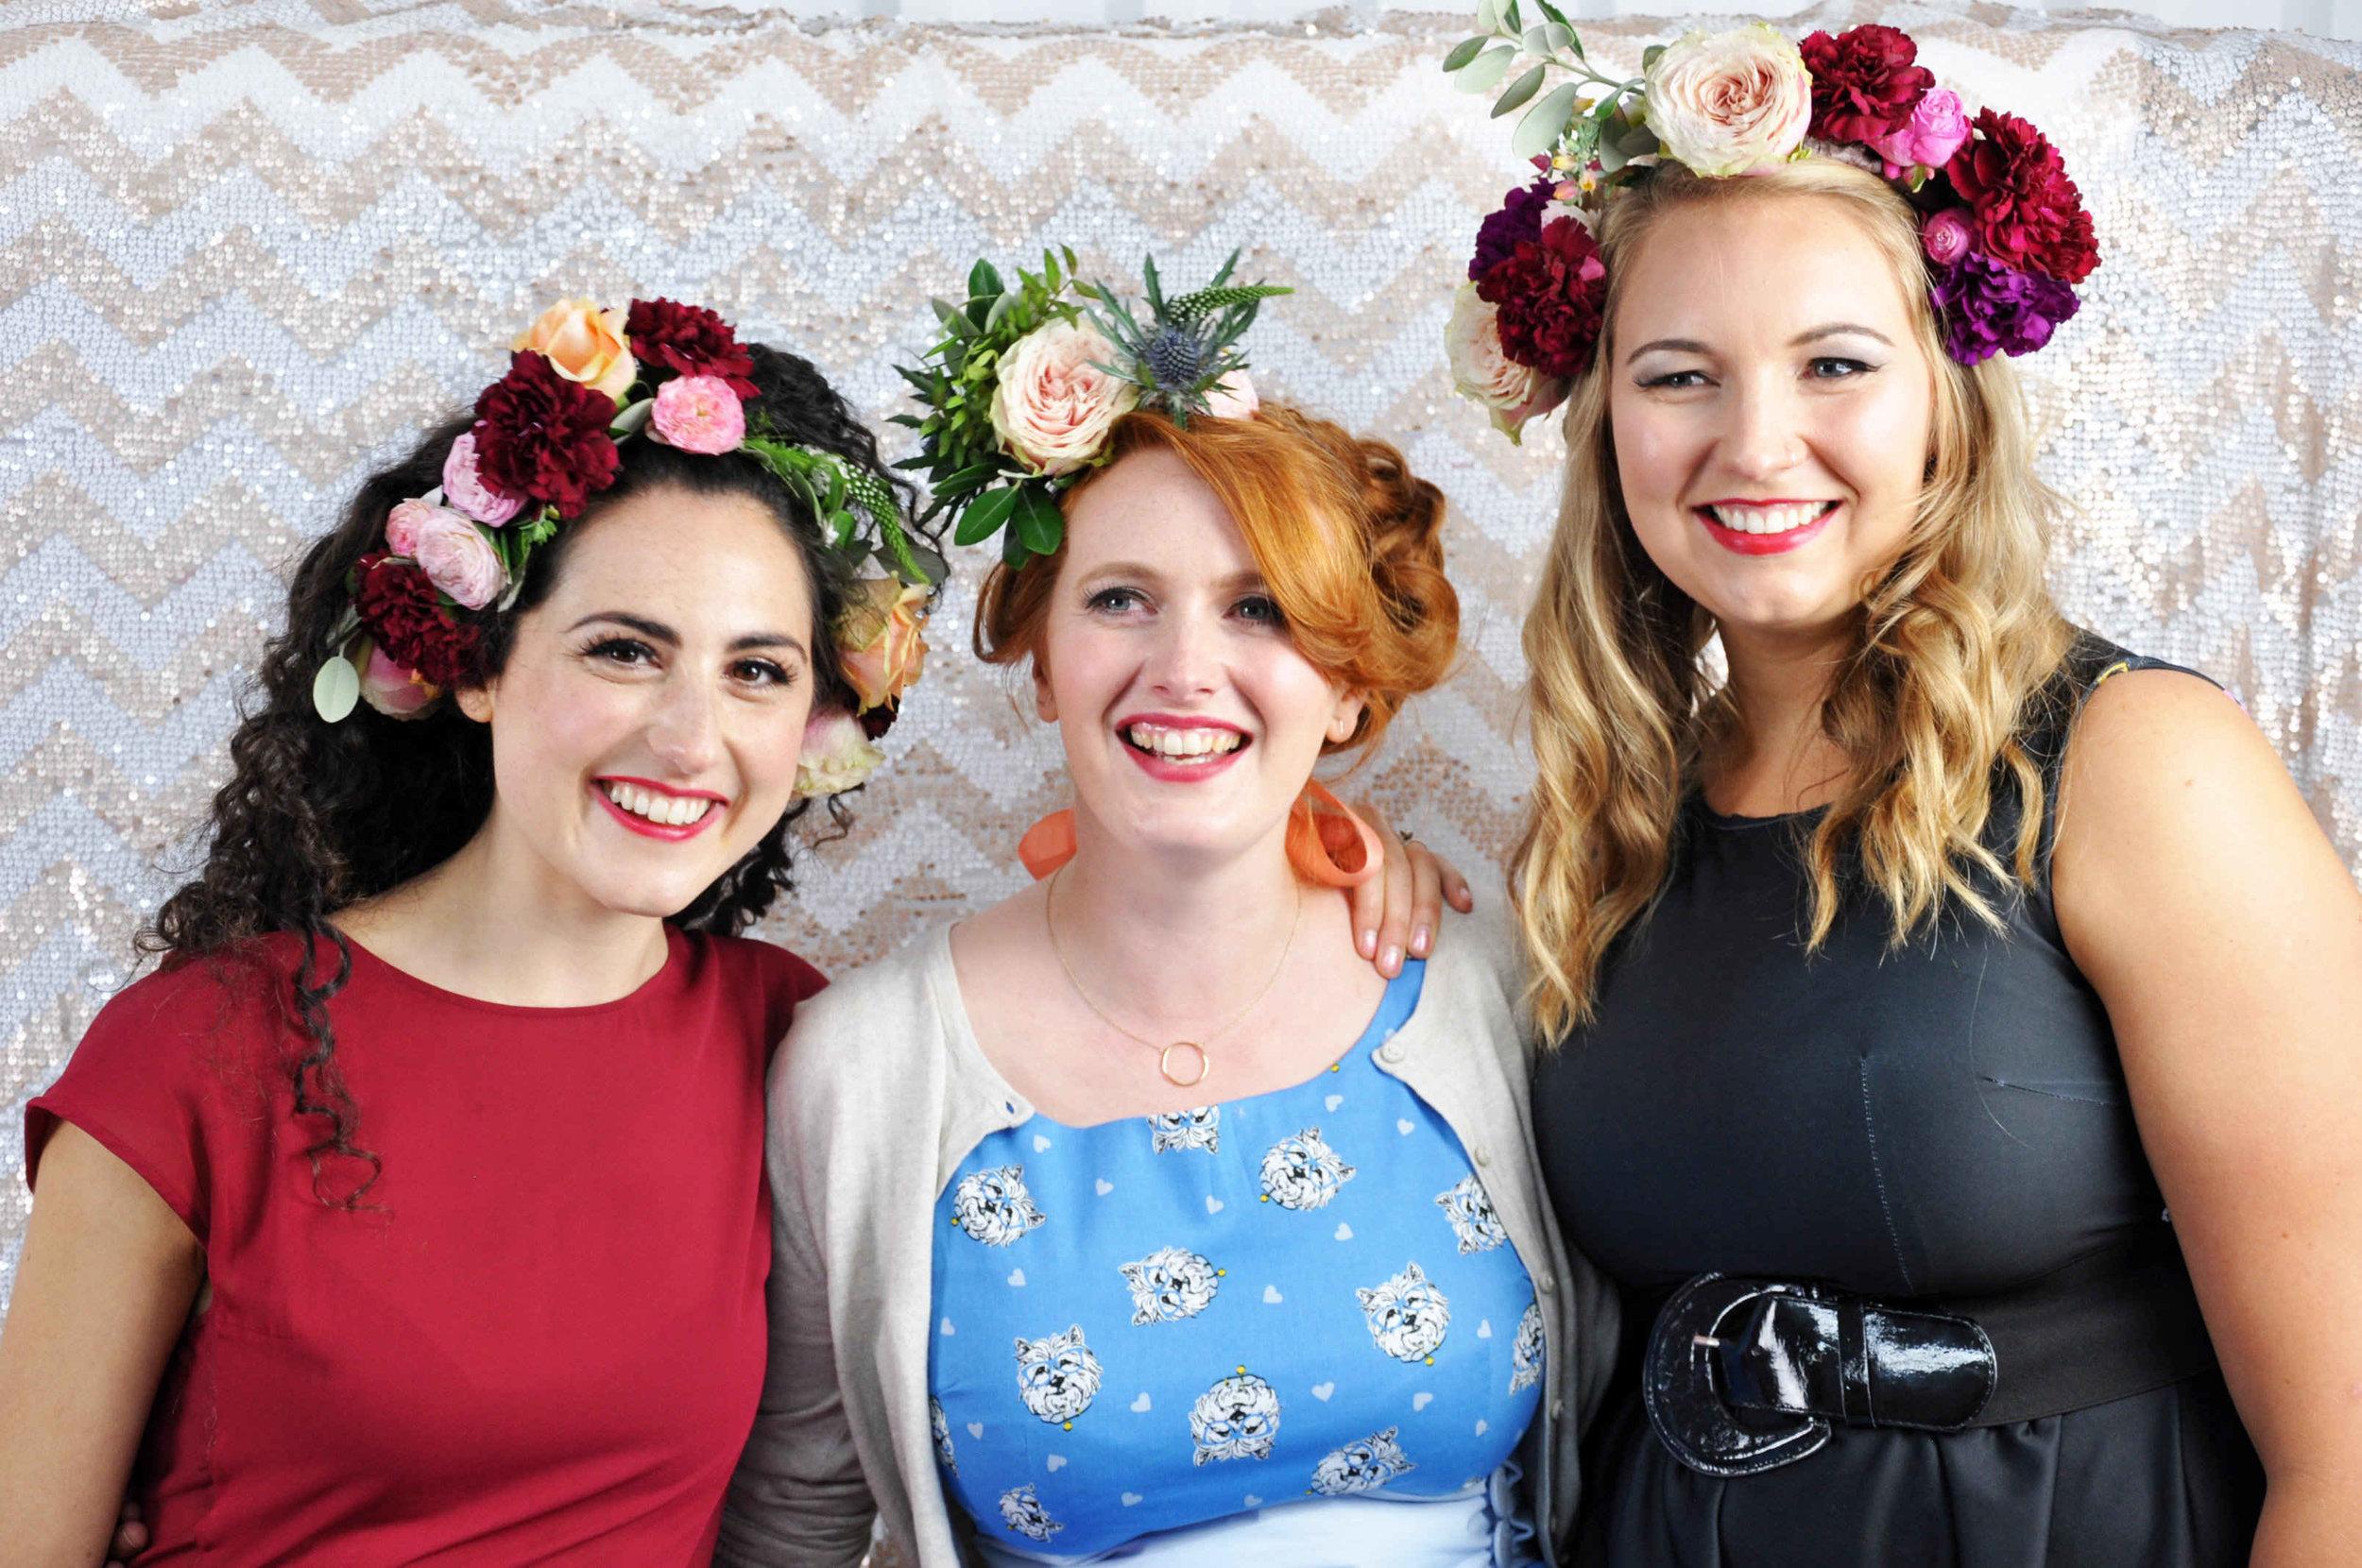 three smiling women wearing flower crown headdresses